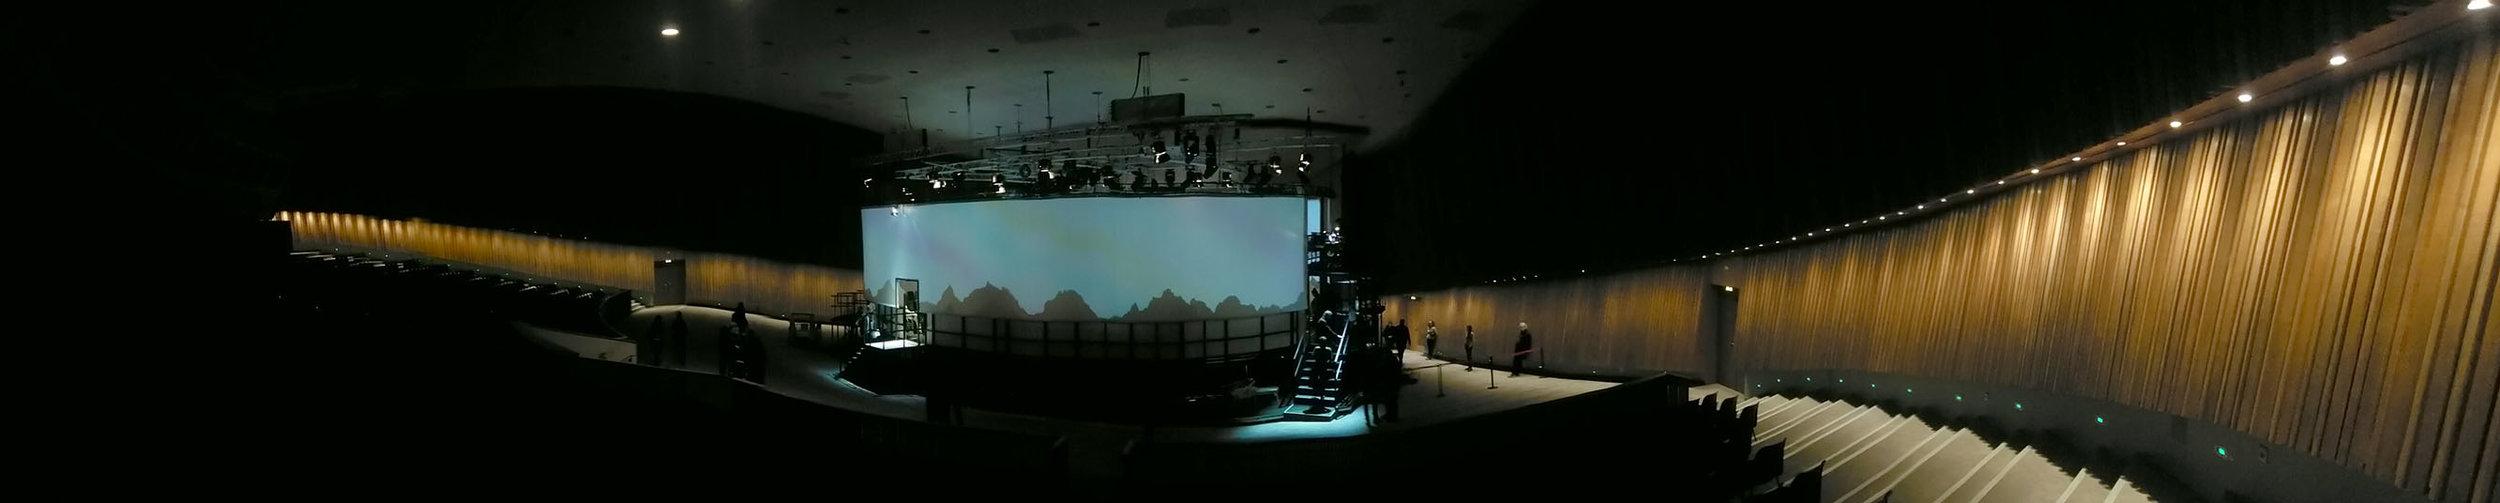 Weltzustand Davos at the Haus der Kulturen der Welt Congress Hall, Berlin